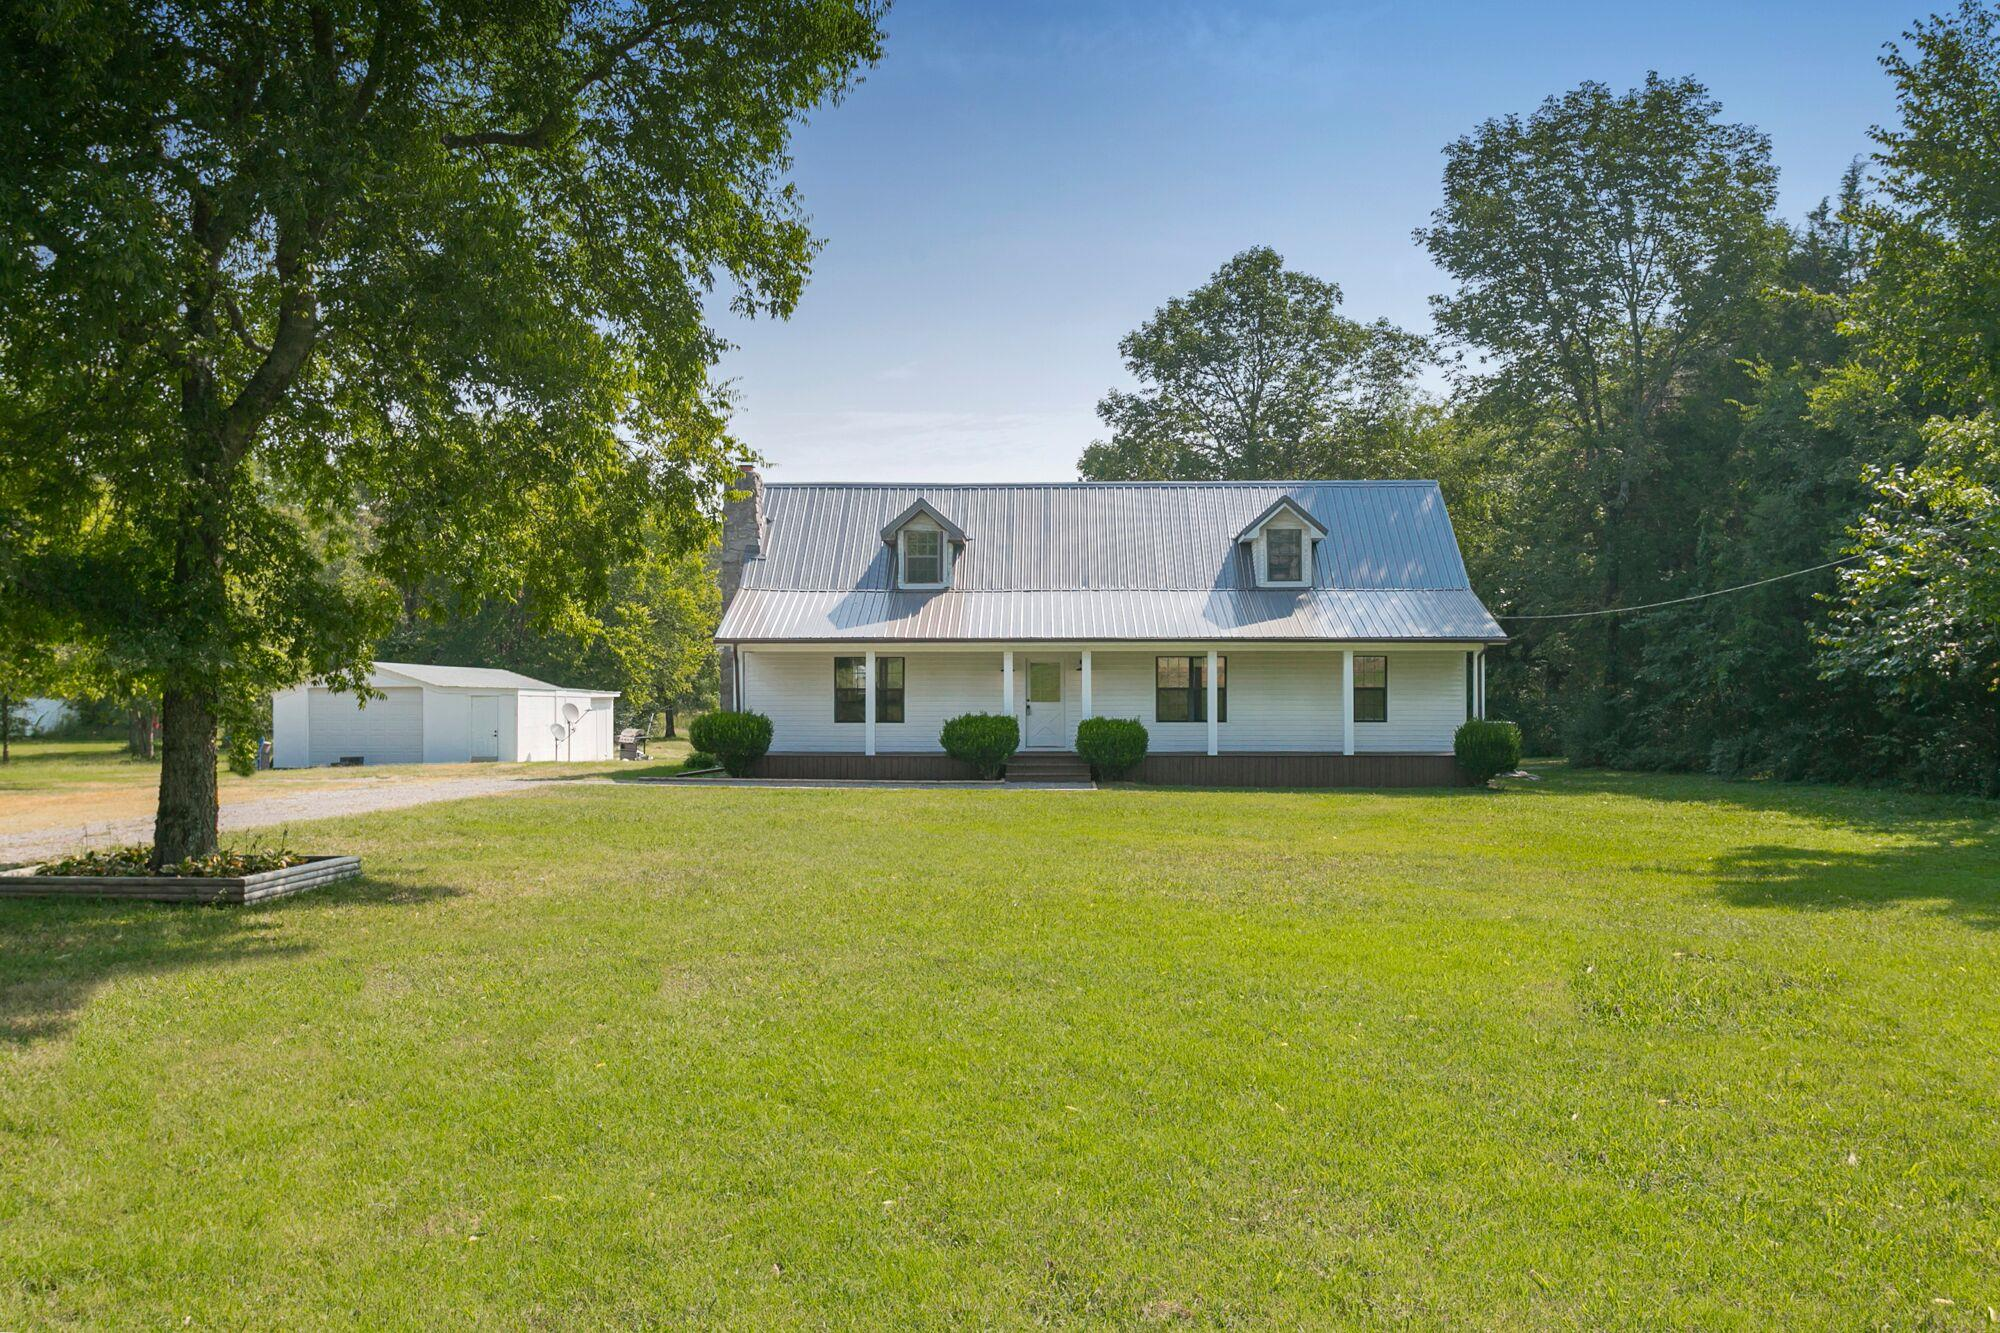 7690 Joe Rowlin Rd, Christiana, TN 37037 - Christiana, TN real estate listing